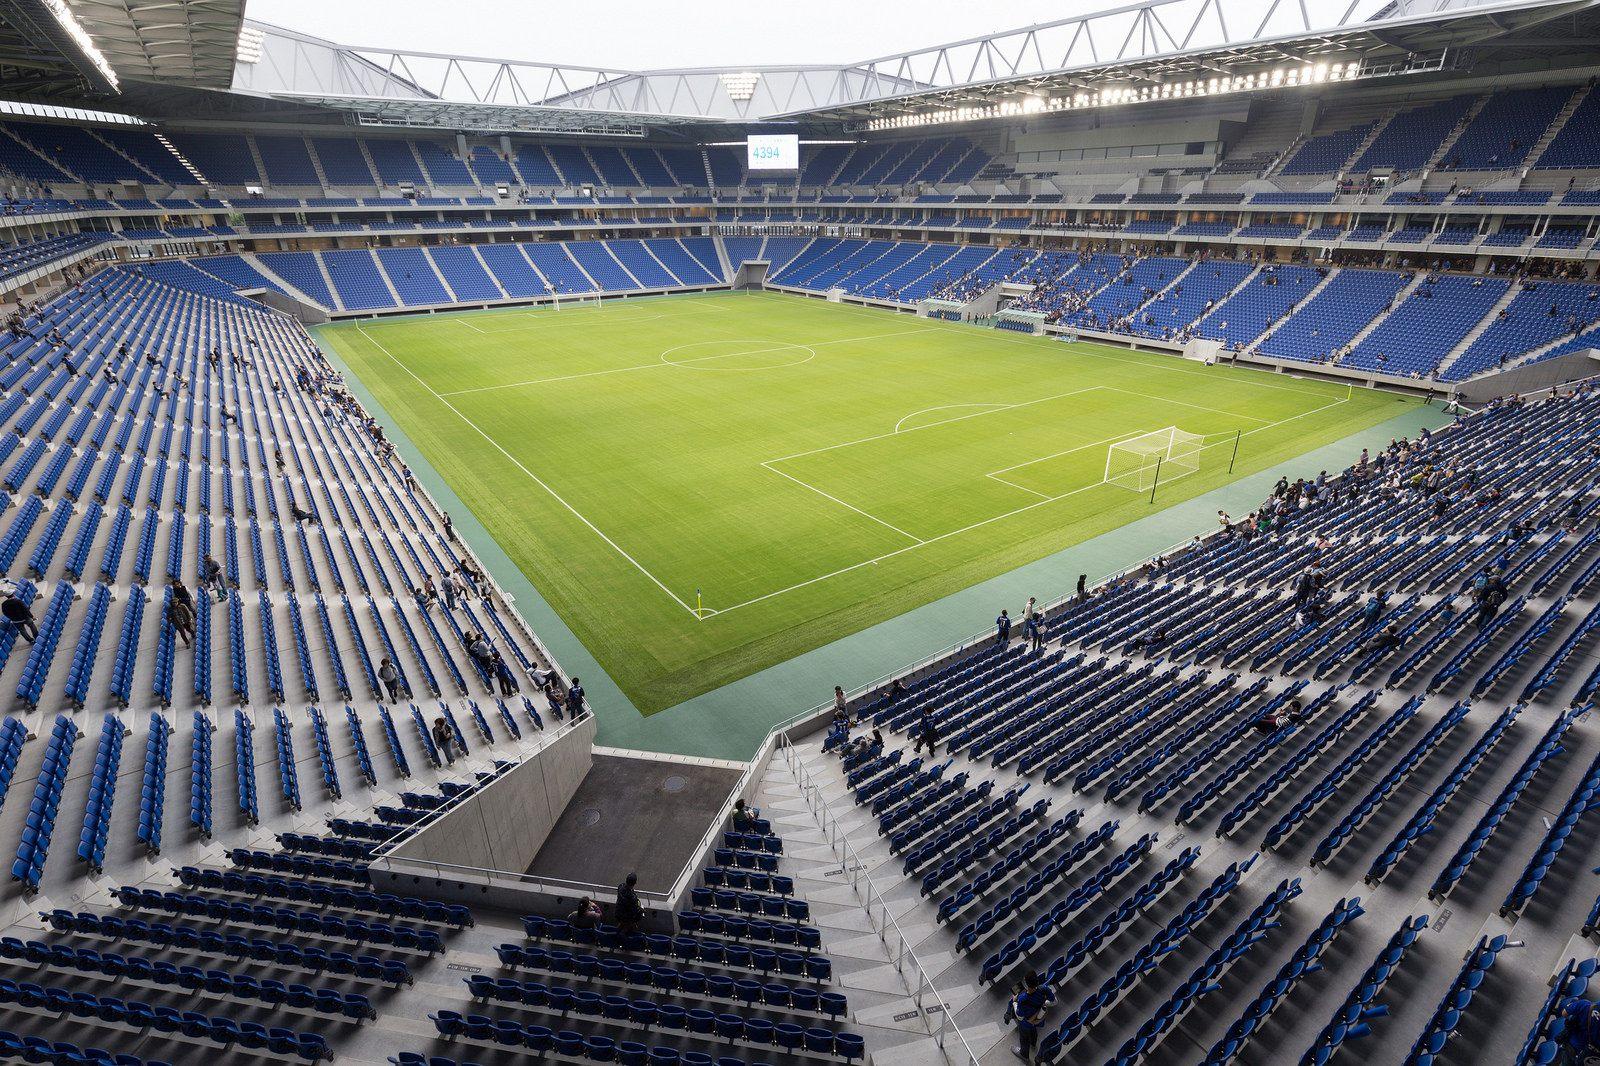 How Long Is A Football Pitch >> Suita City Football Stadium (Gamba Osaka Stadium) – StadiumDB.com